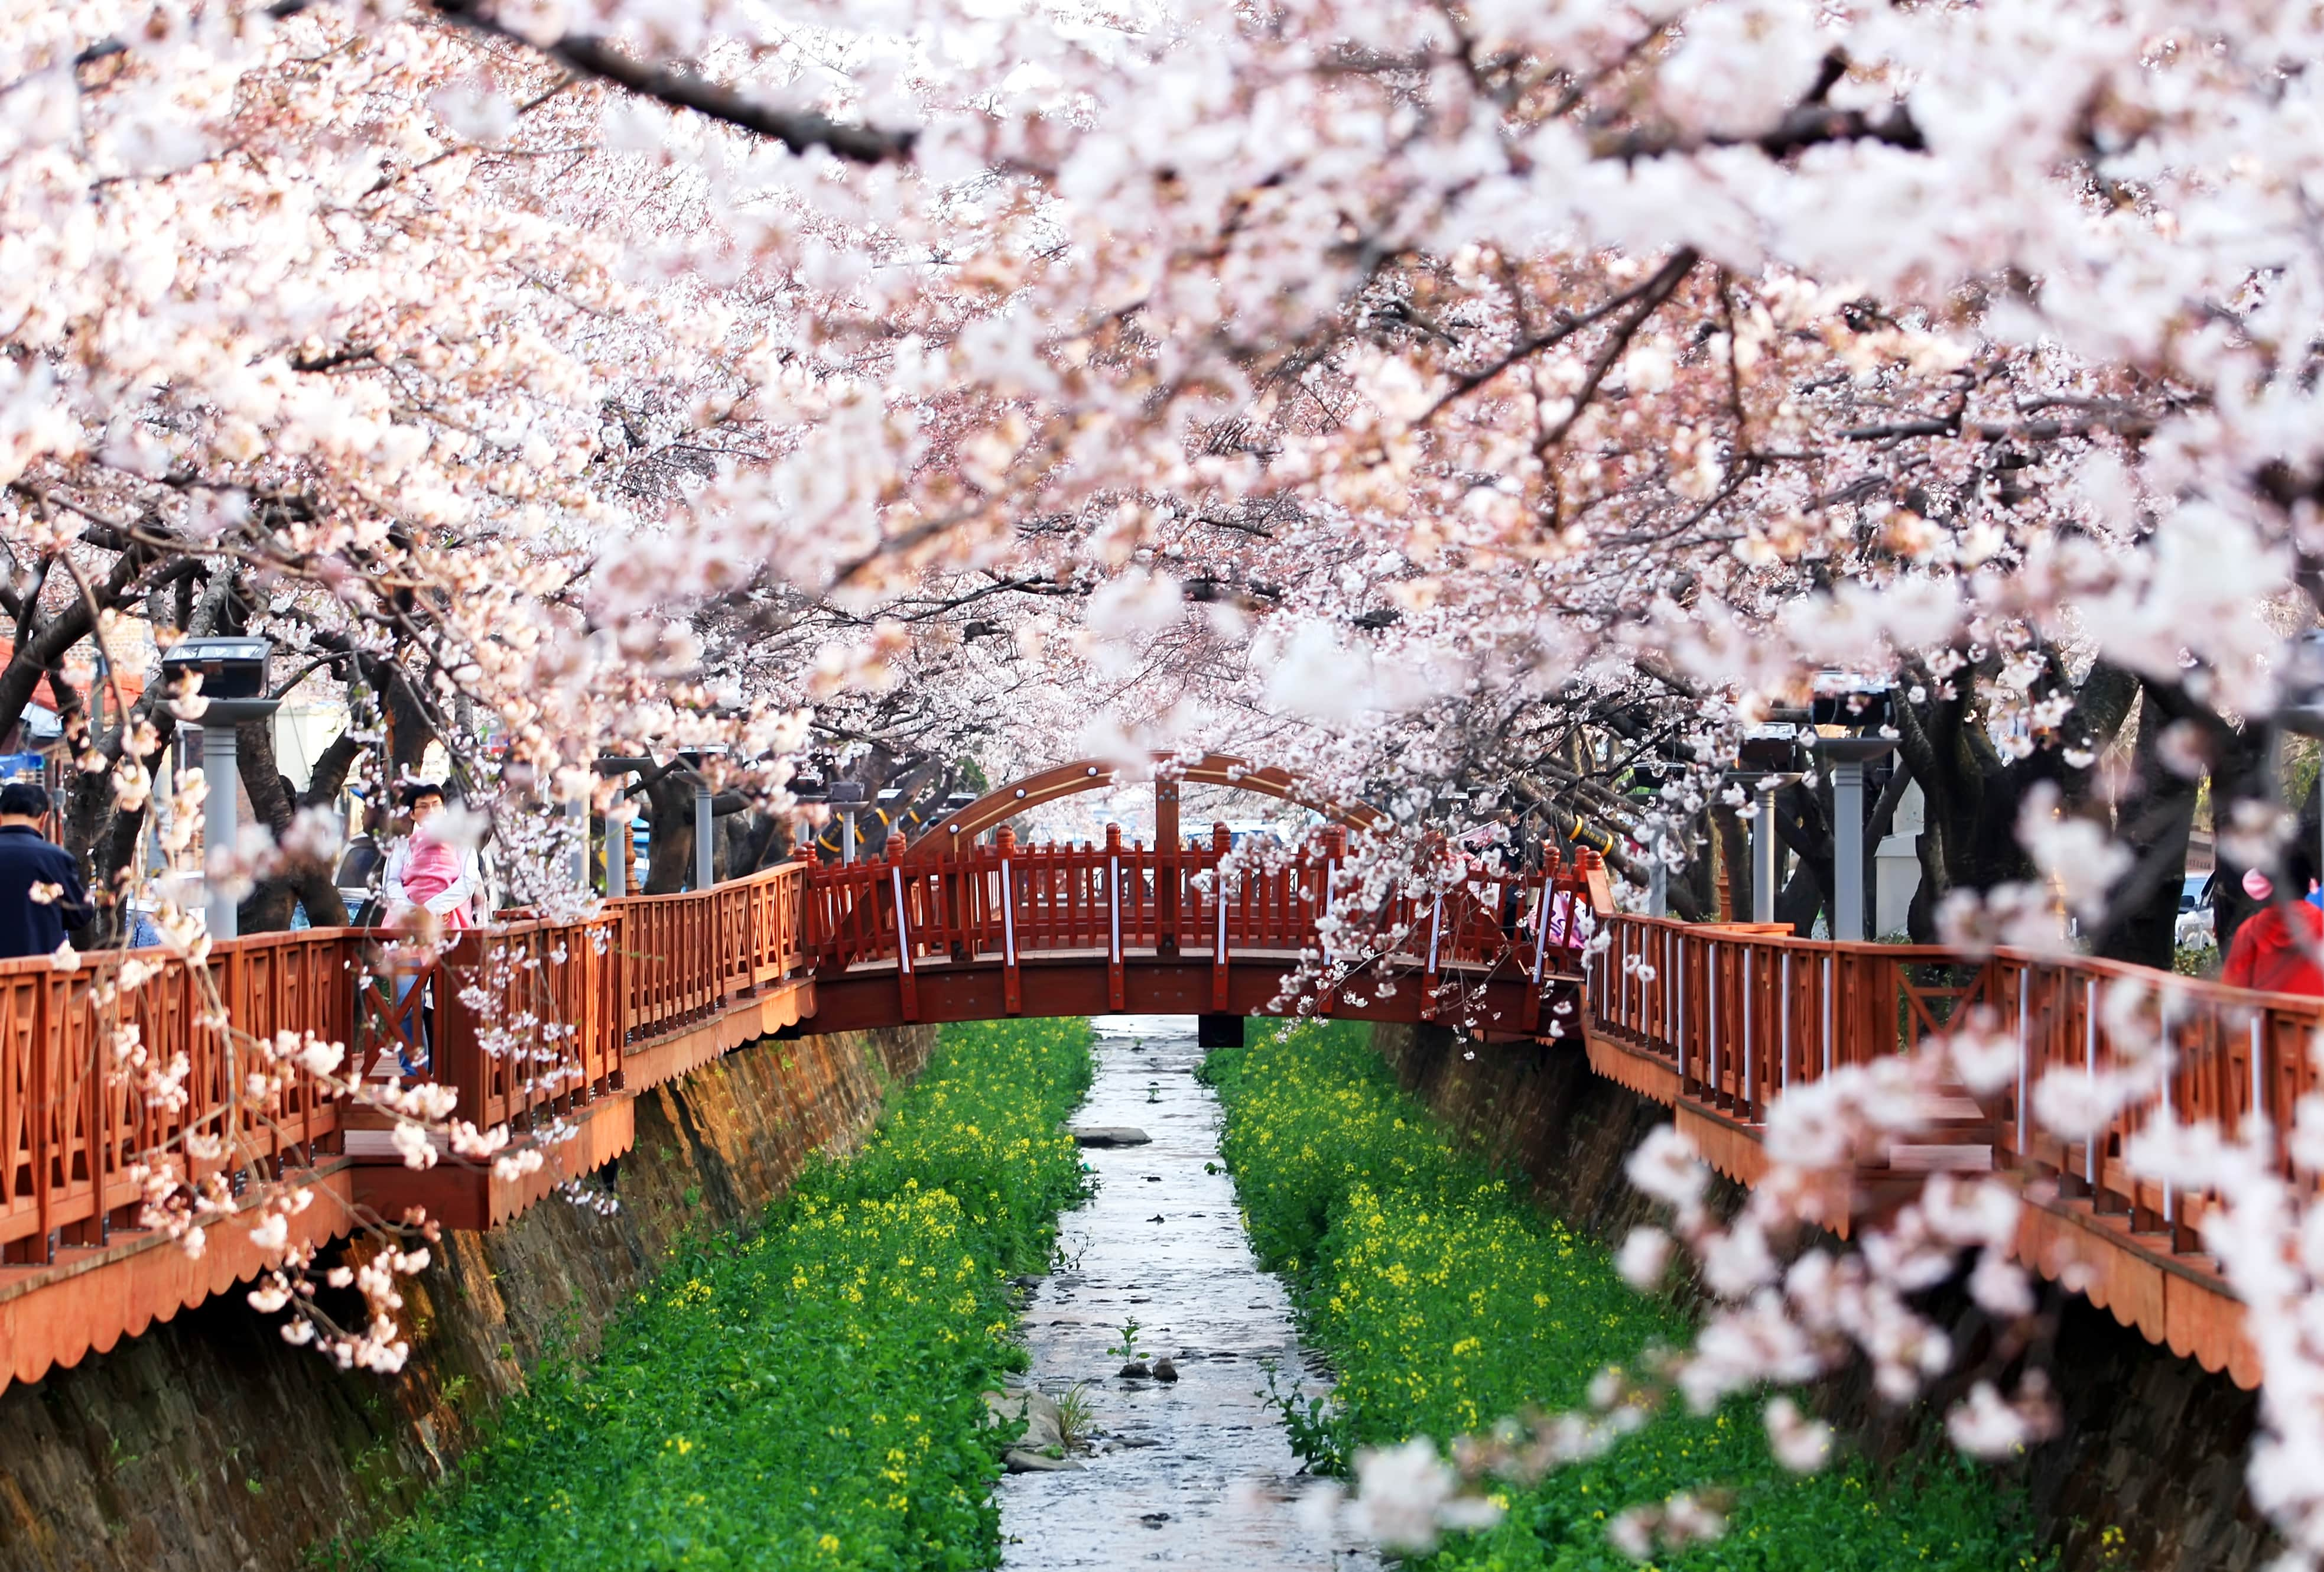 galian-bandar-dan-pesta-bunga-sakura-secret-world